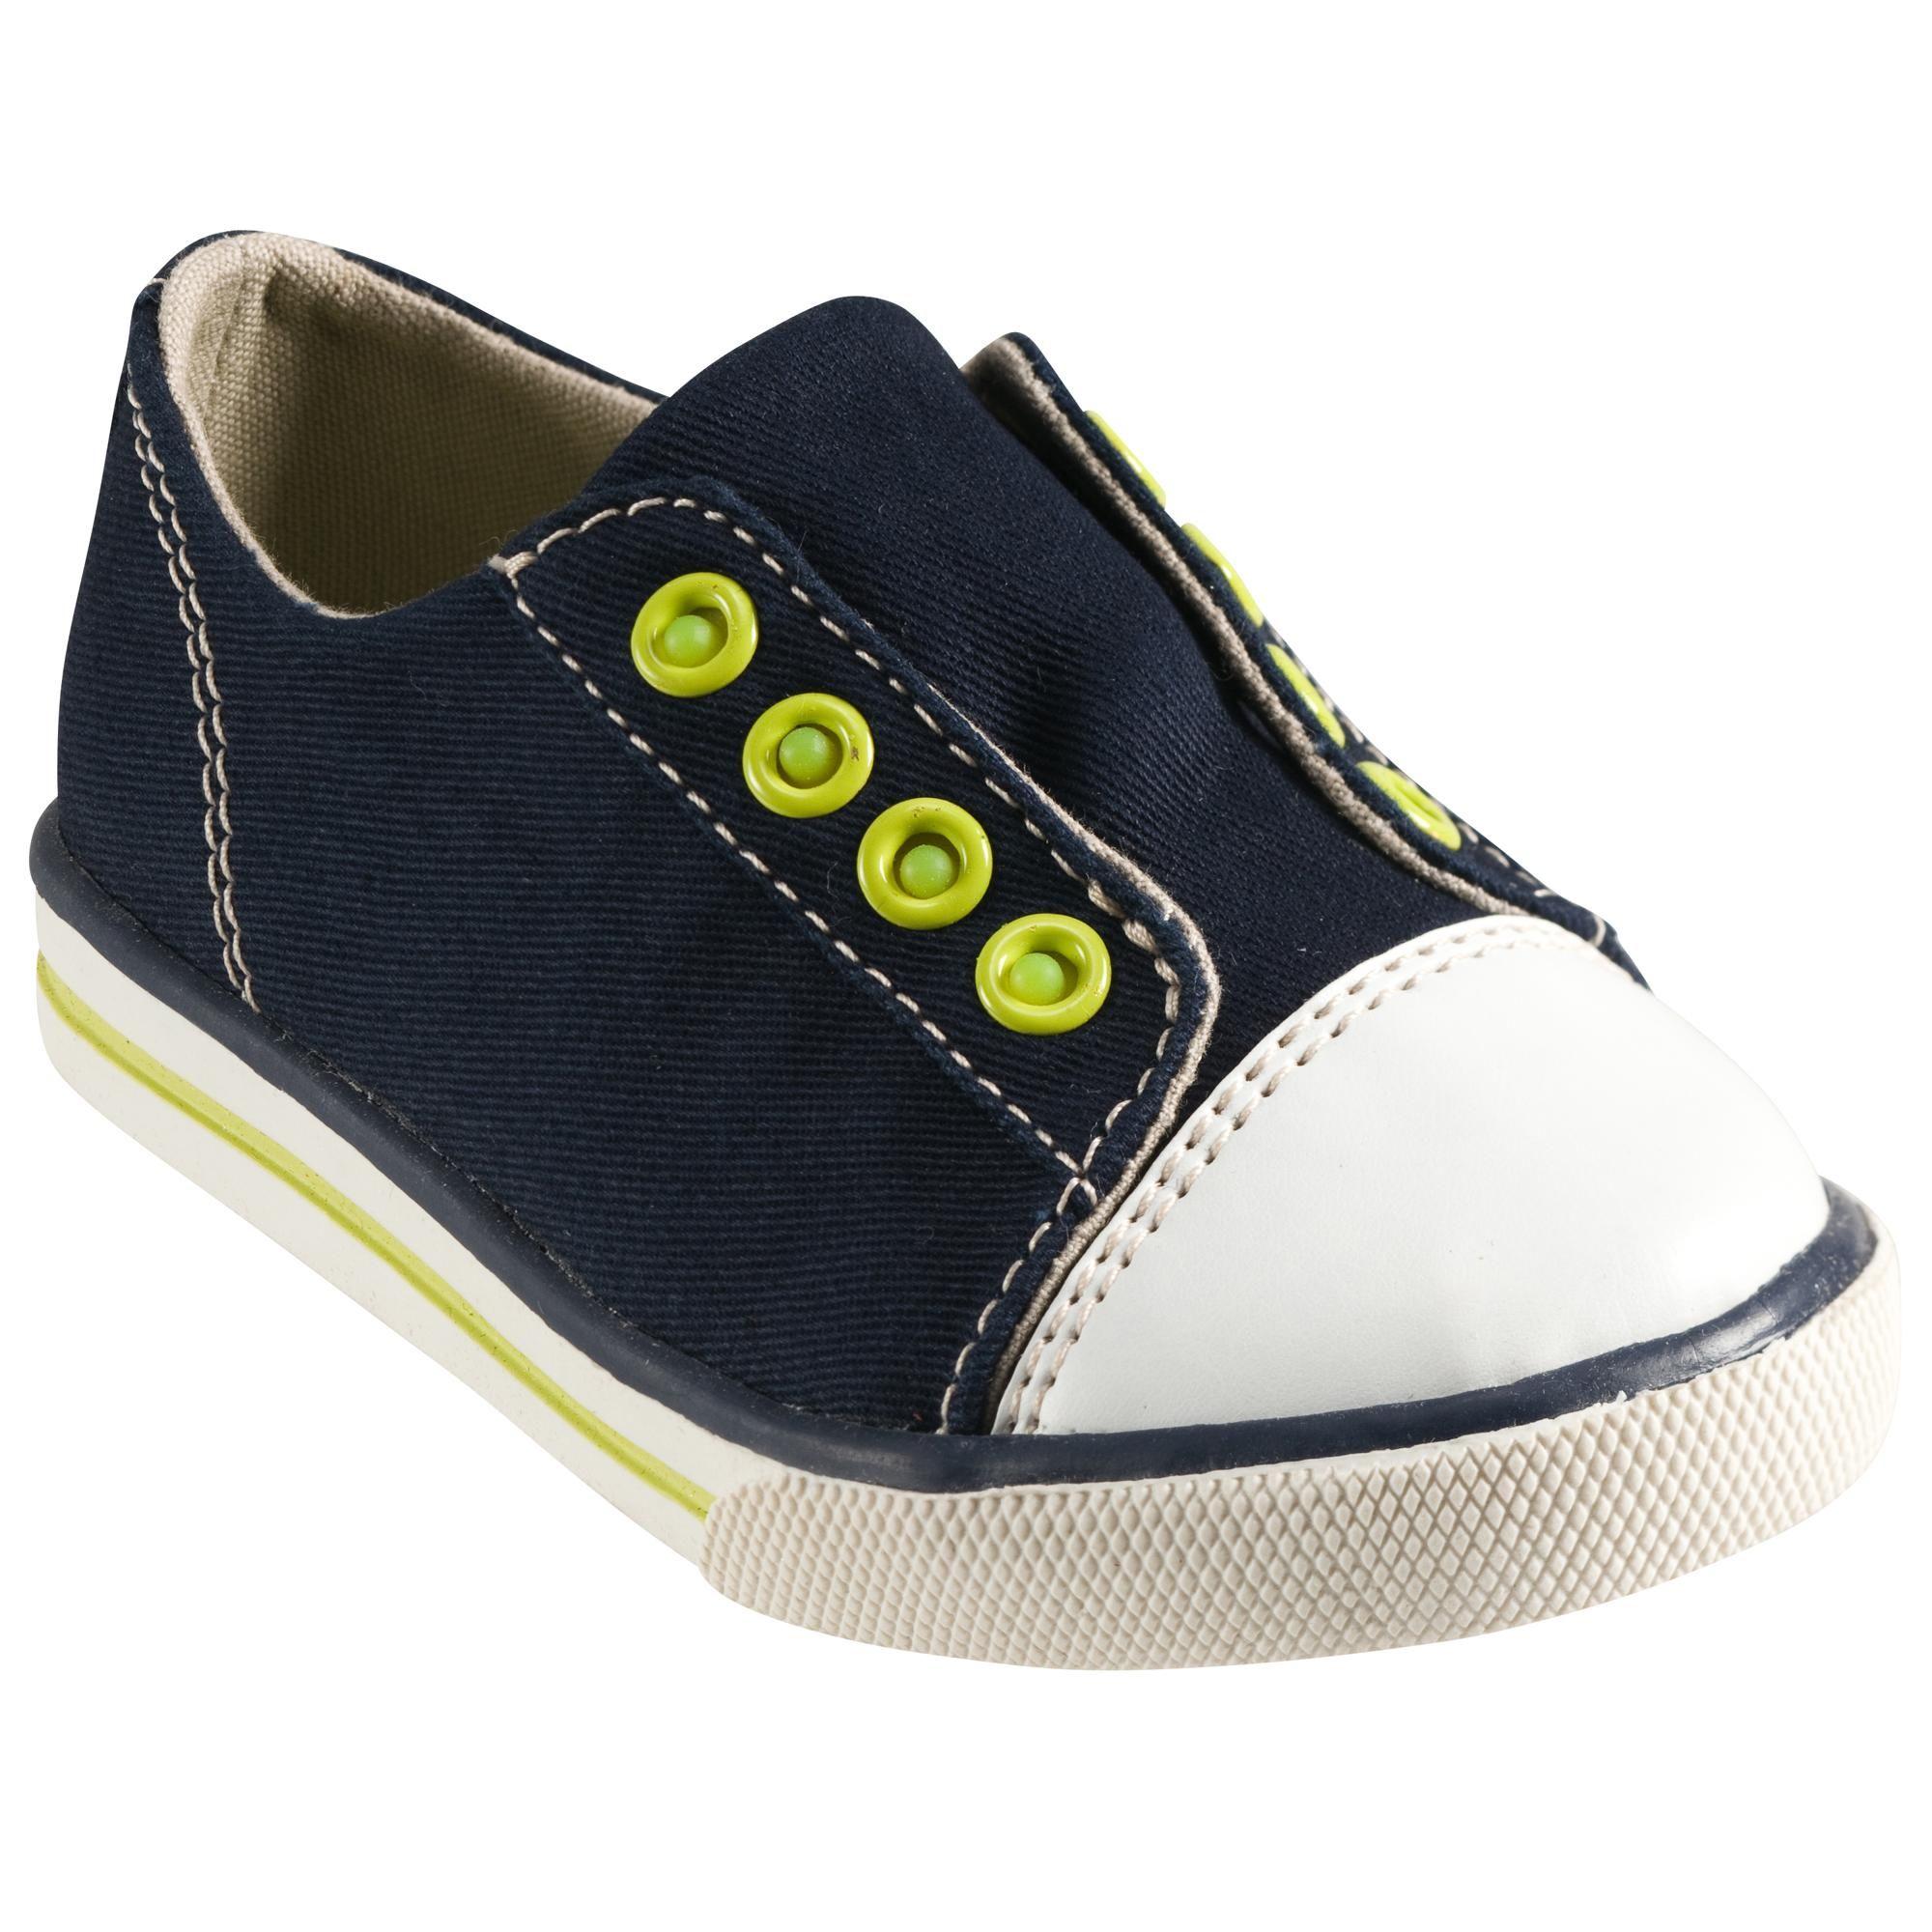 Slip Sneakers Baby Boy Accessories Shop Carters